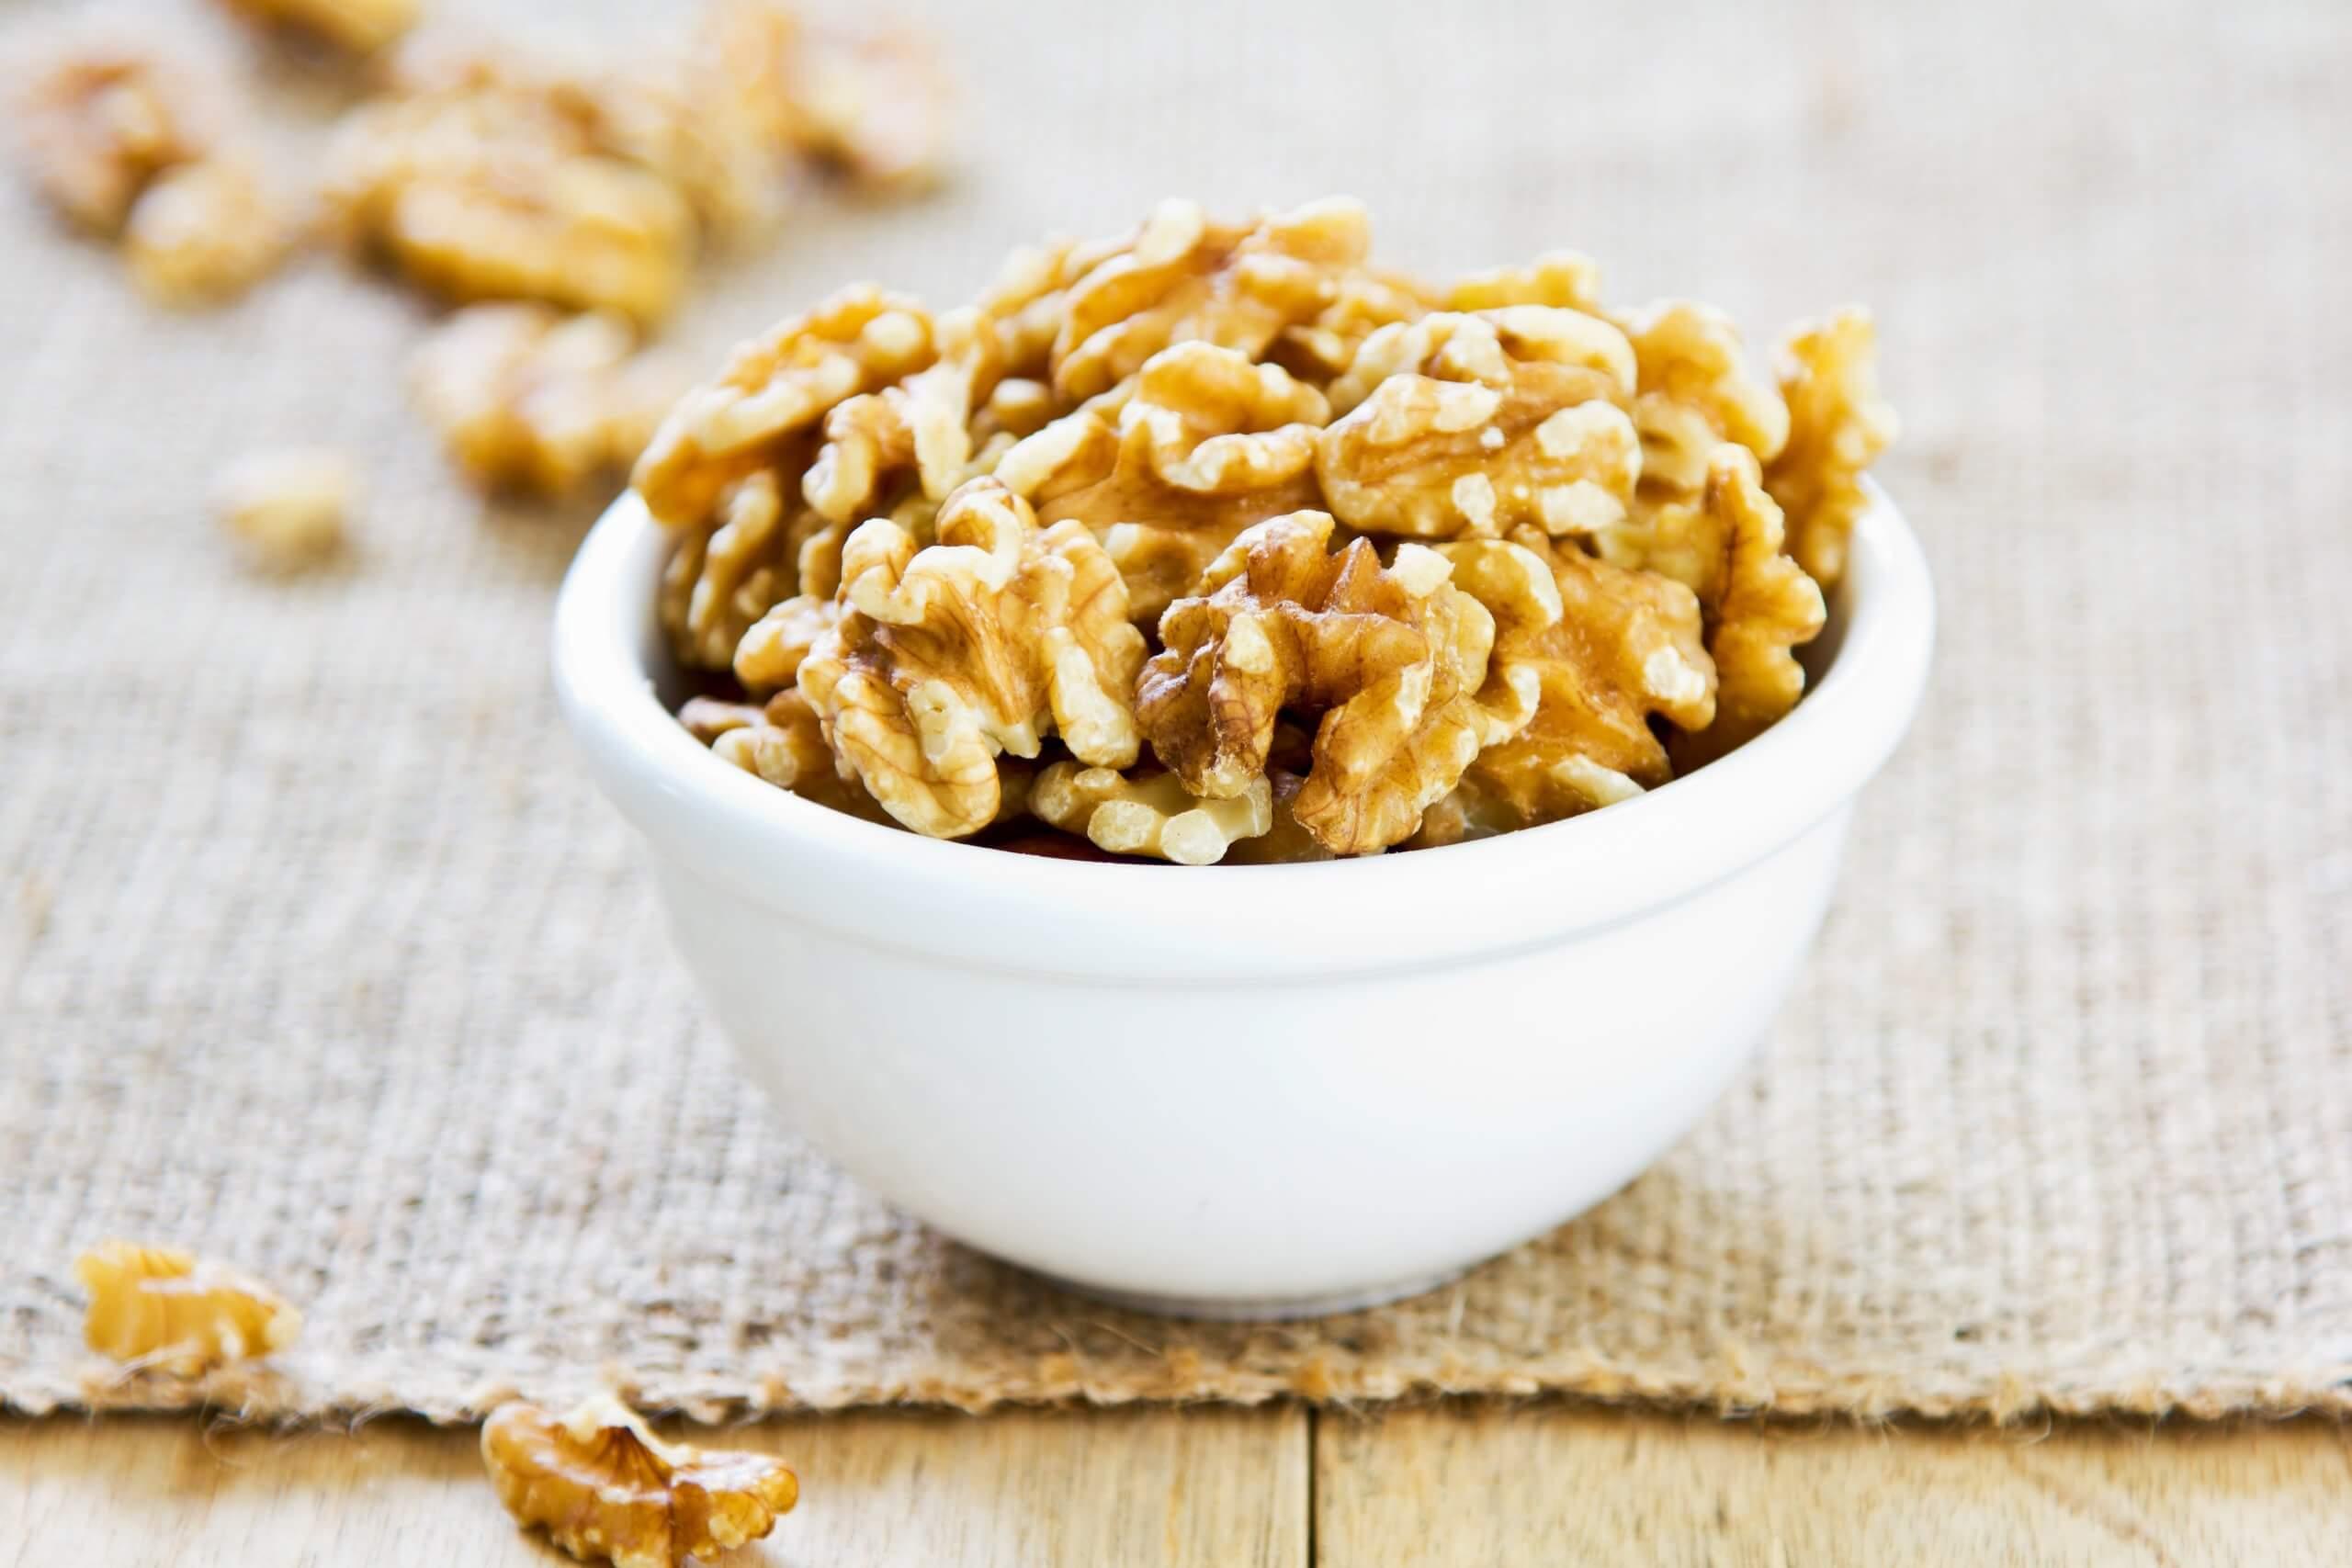 Walnut-Nutto-Frutto-15-scaled.jpg